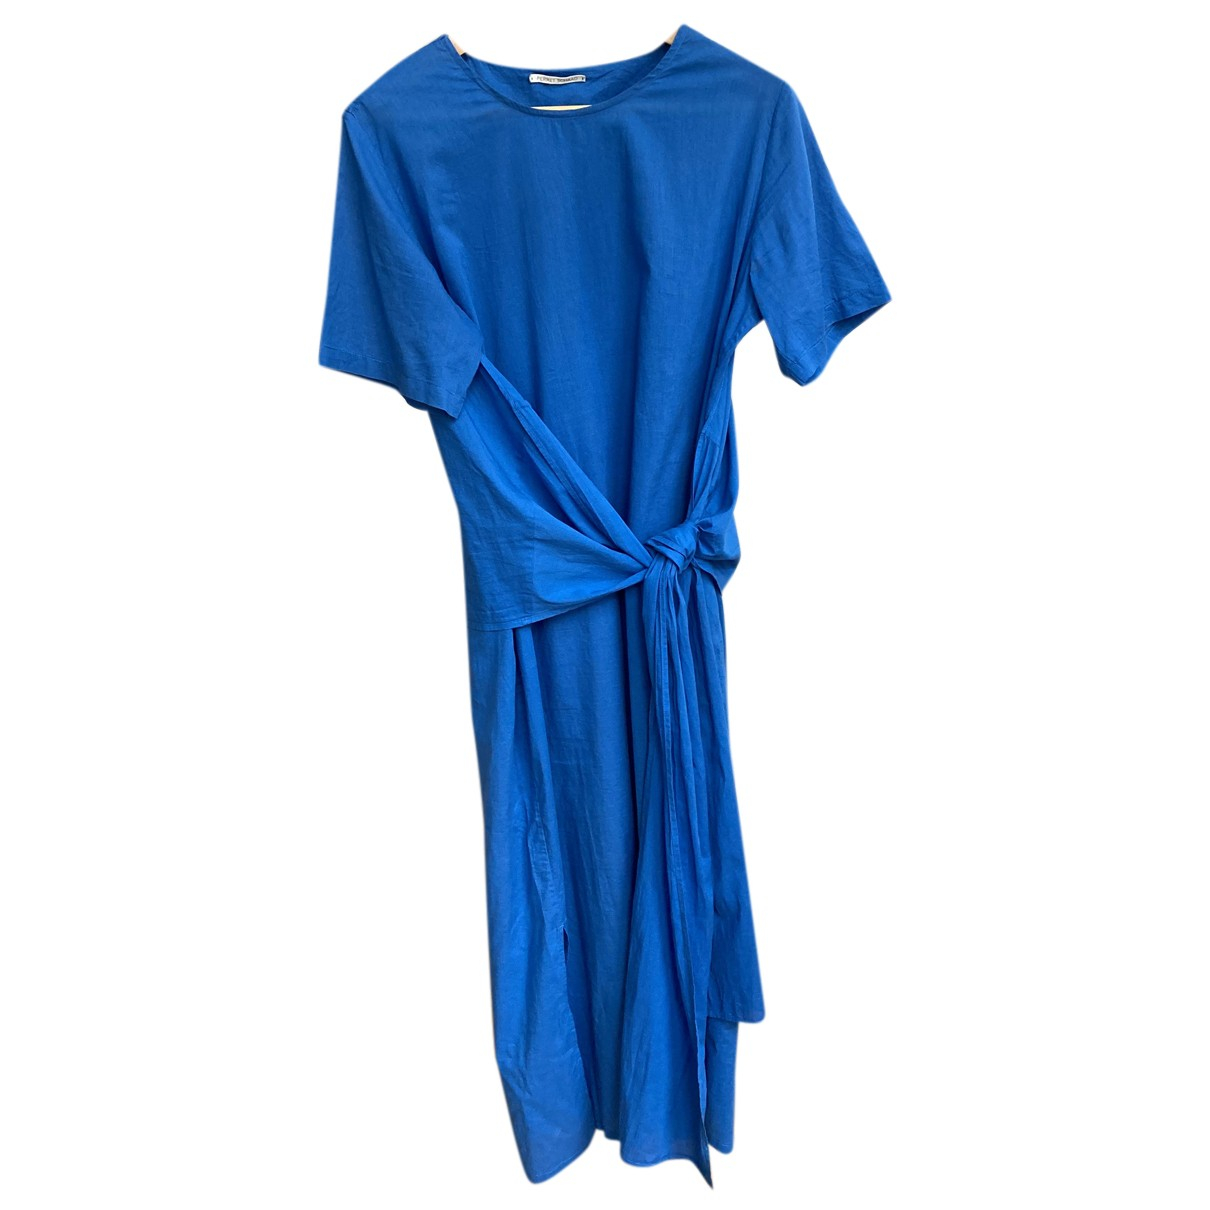 Perret Schaad - Robe   pour femme en coton - bleu